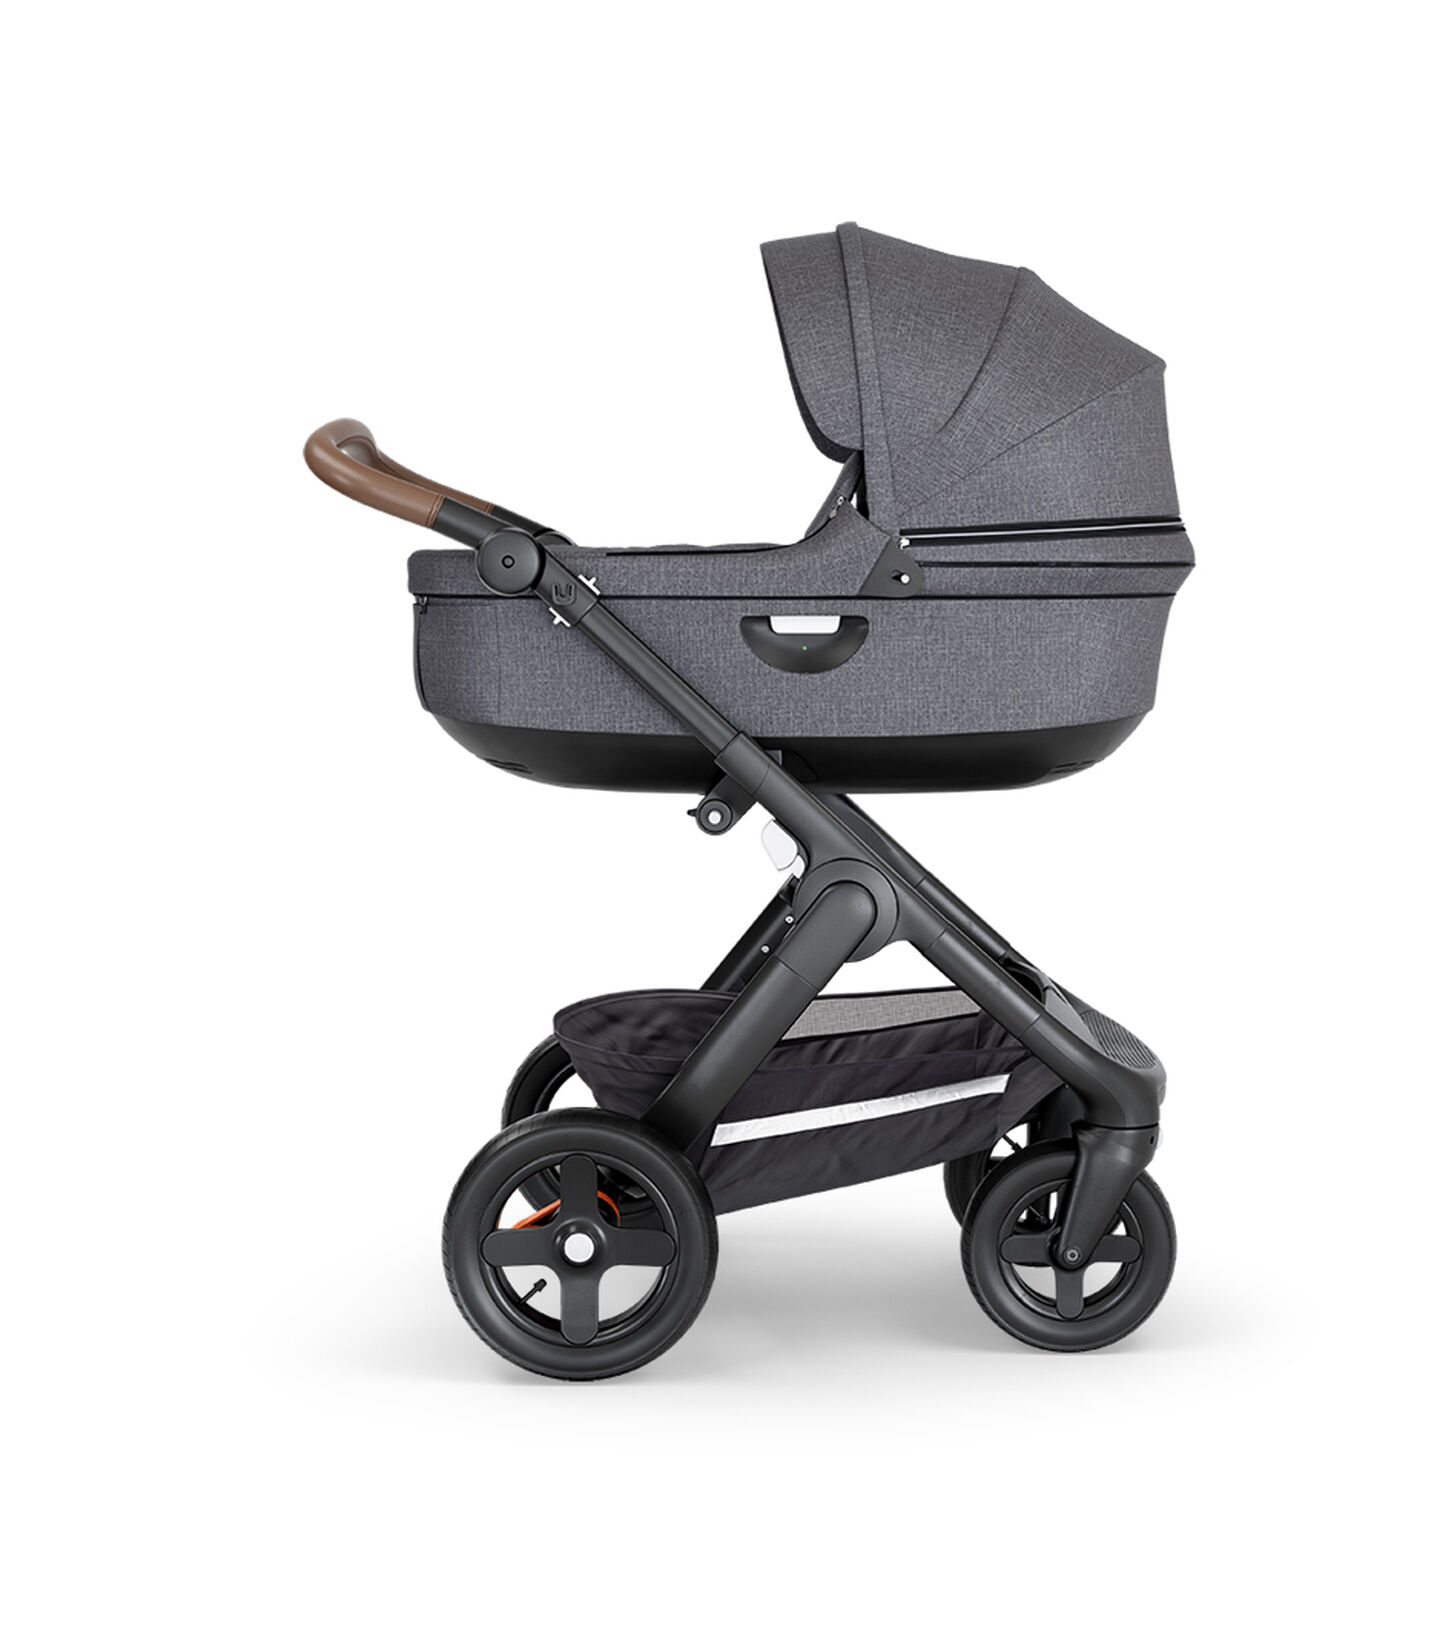 Stokke® Trailz™ with Black Chassis, Brown Leatherette and Terrain Wheels. Stokke® Stroller Carry Cot, Black Melange.